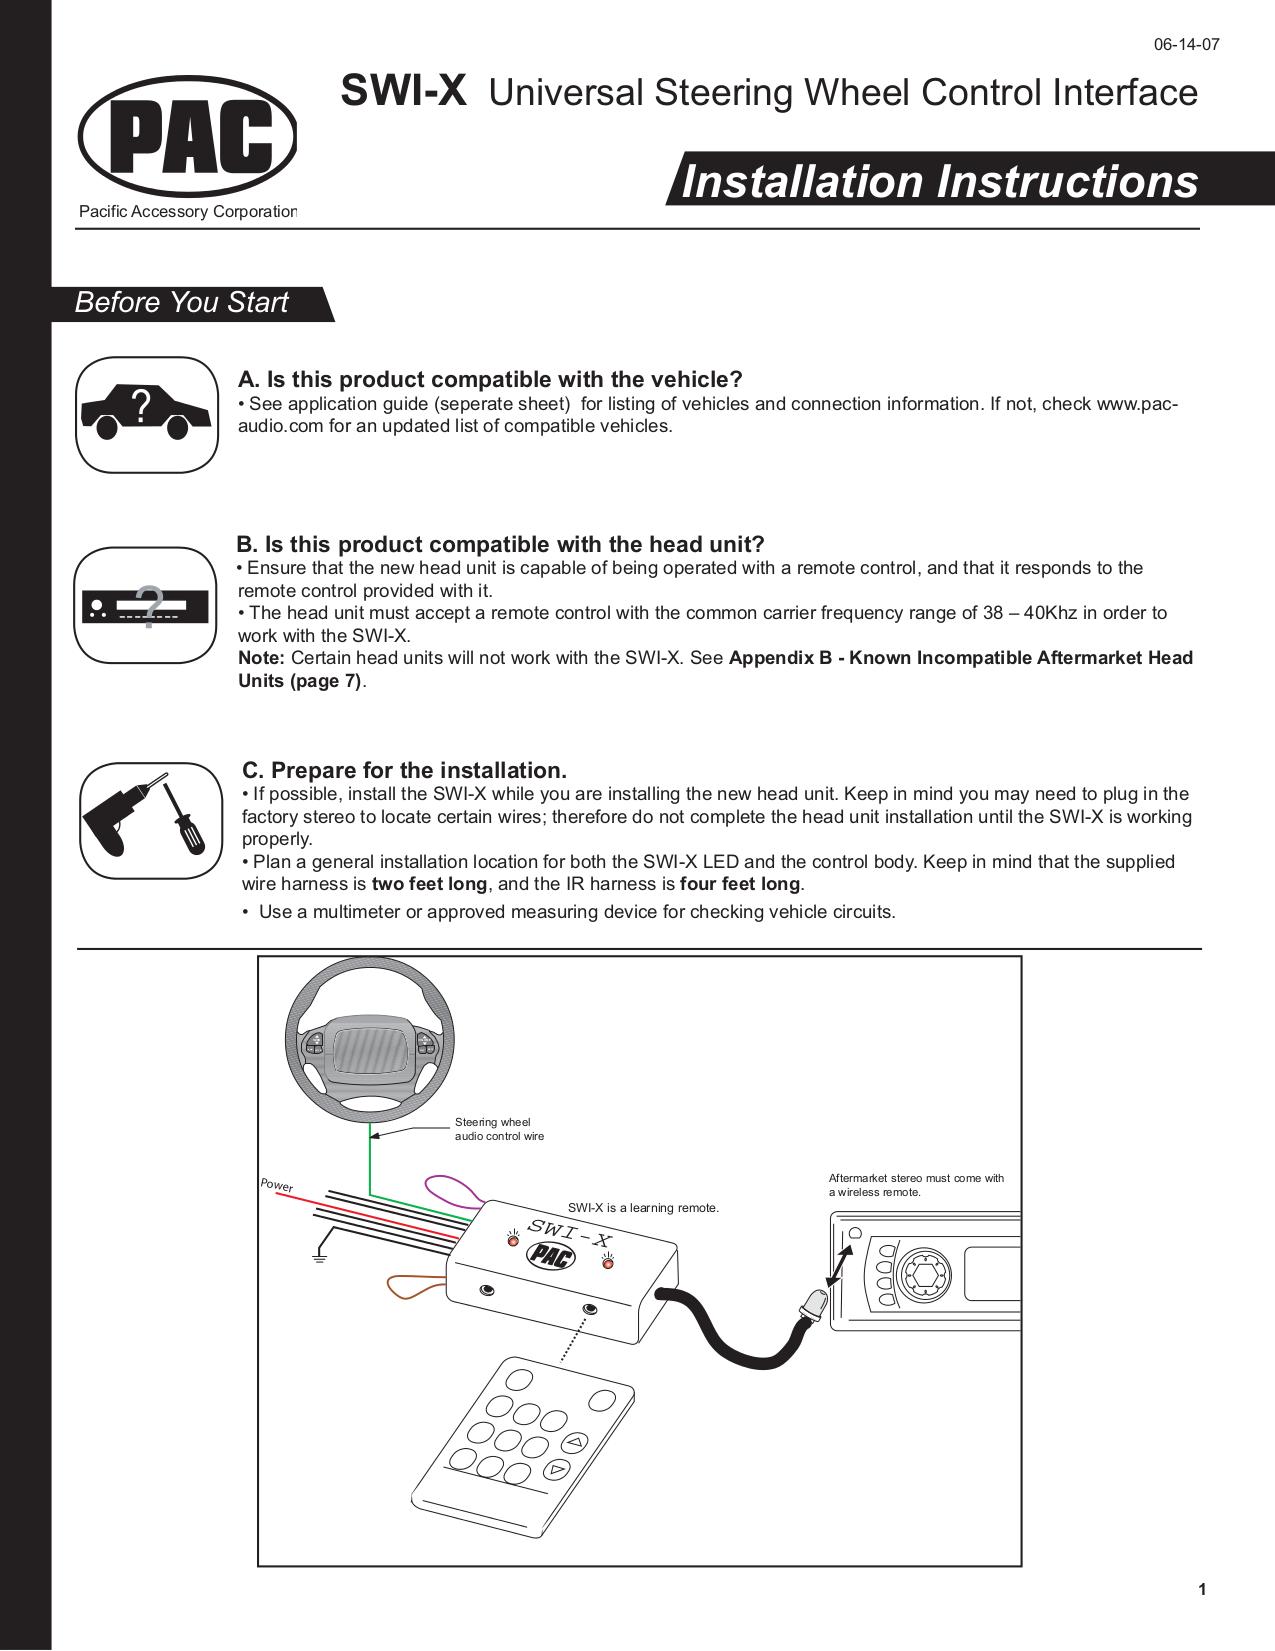 Sony Video Manuals Download Location 2006 Honda Pilot Besides 2001 Chevy Prizm Fuse Box Diagram Pdf For Car Xav 7w Manual